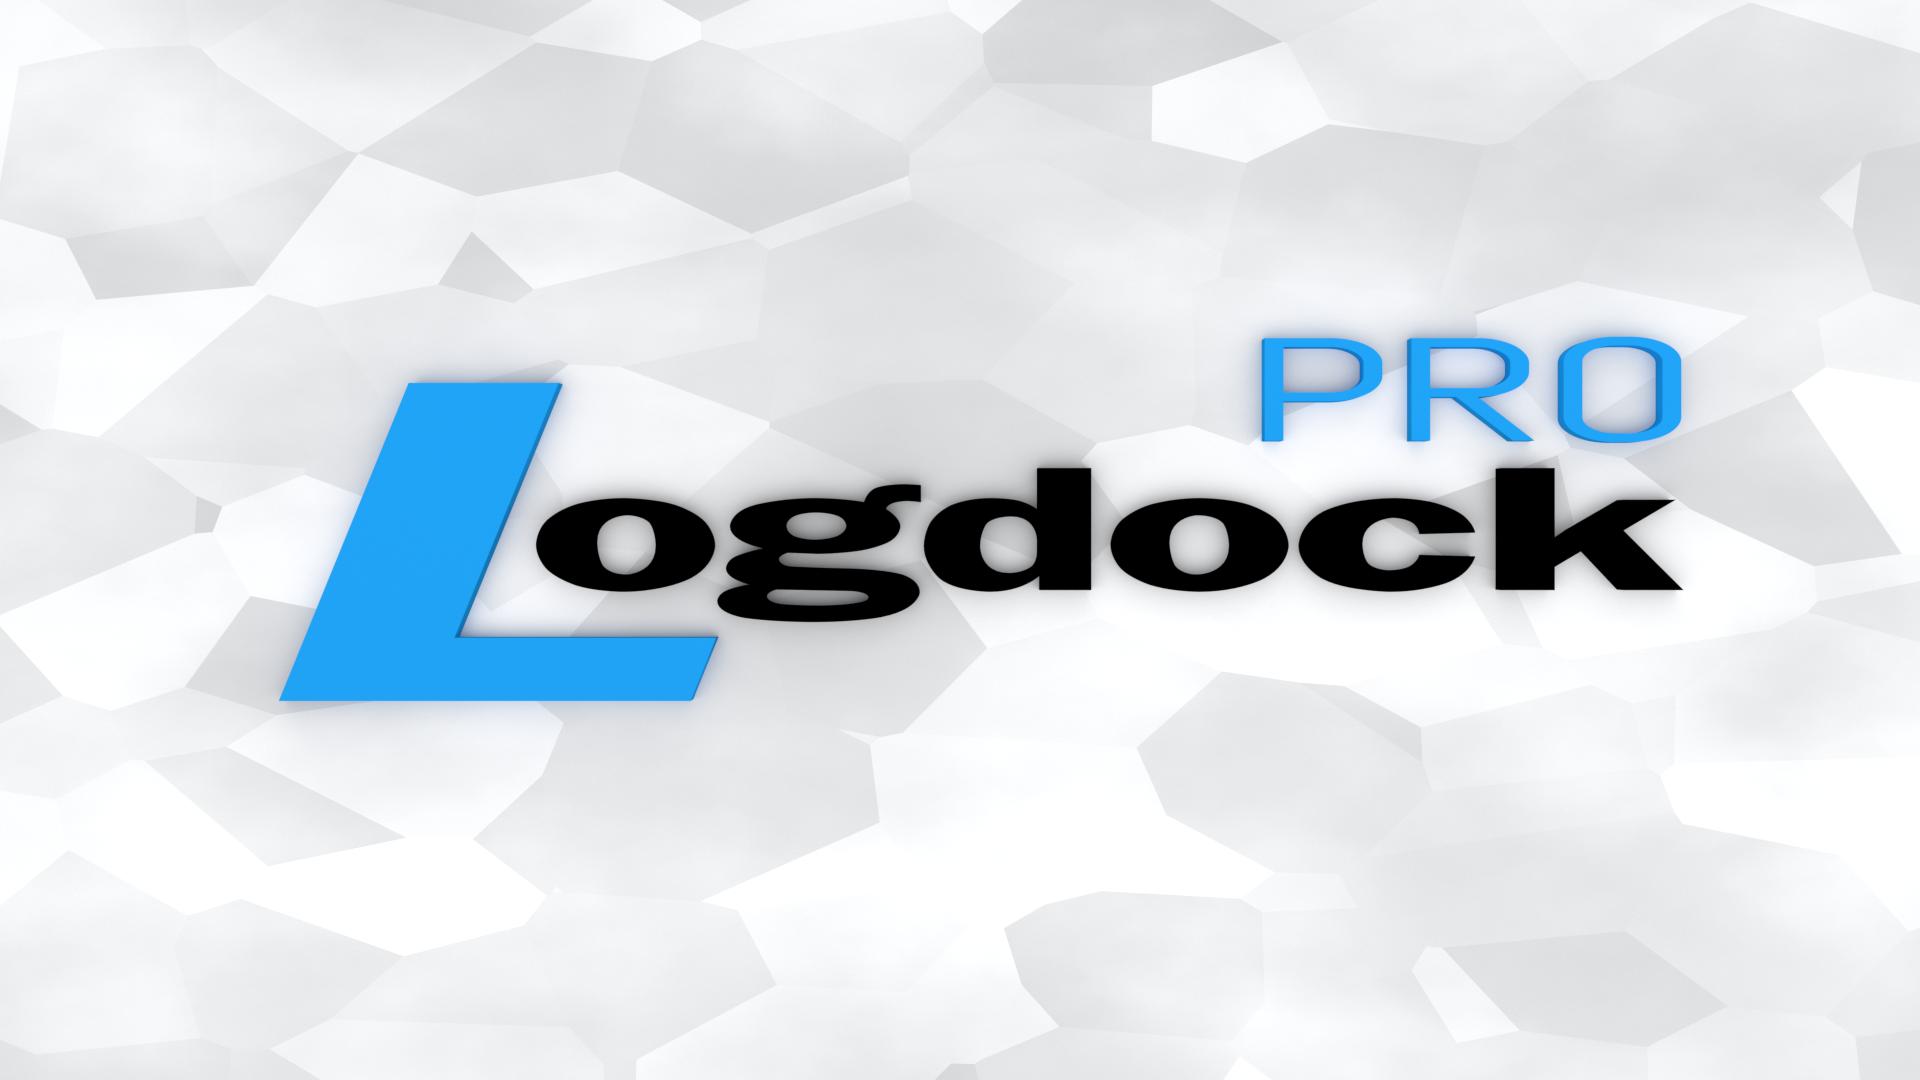 Logdock PRO